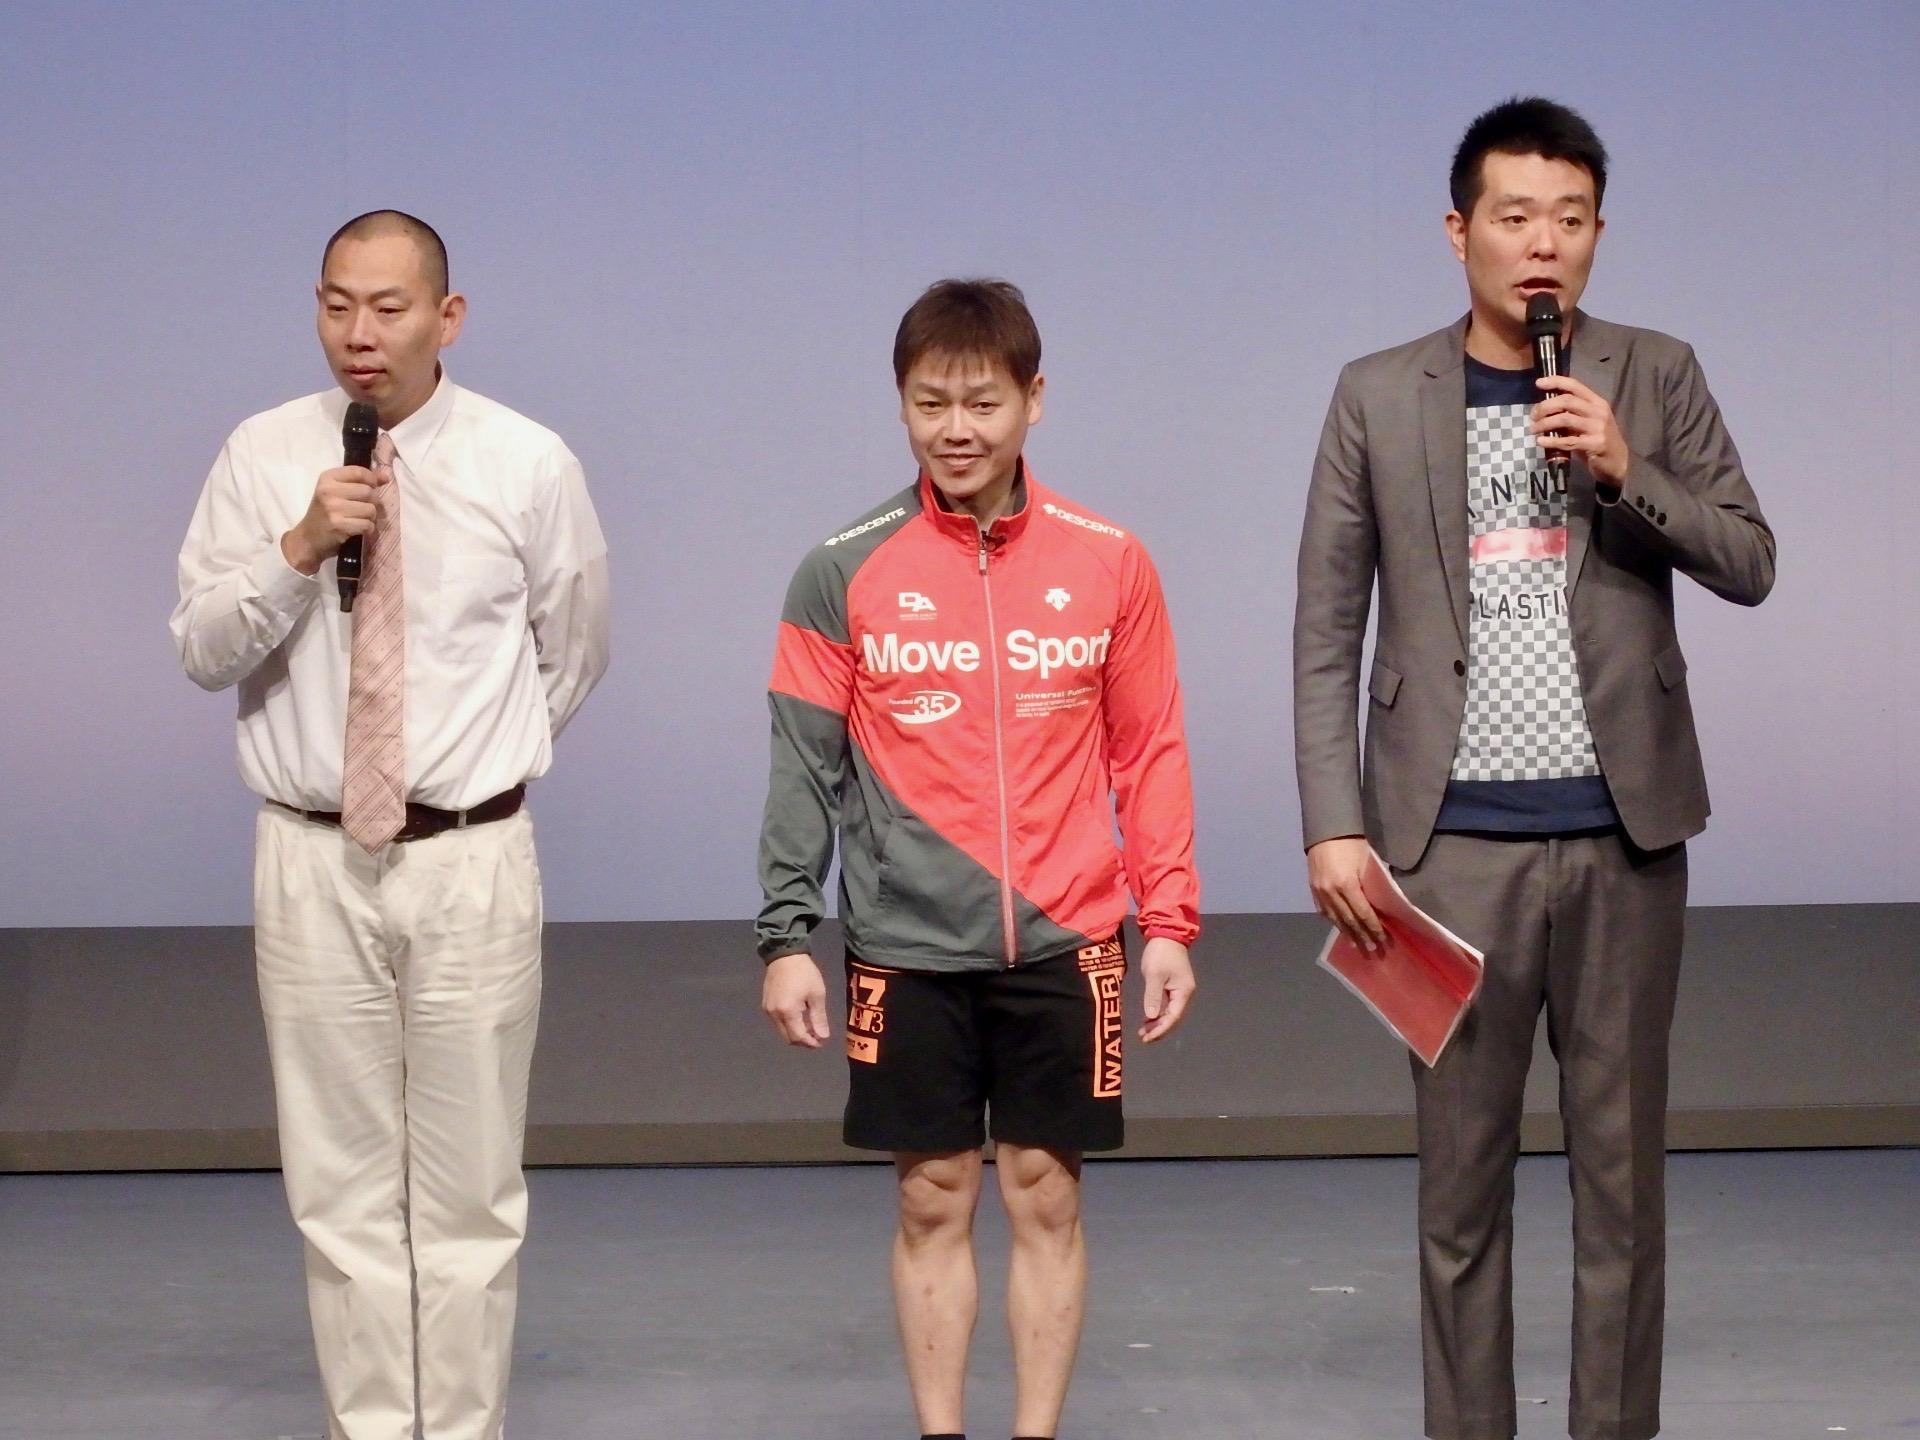 http://news.yoshimoto.co.jp/20180210000536-c74f31f376489be65f0703ef45db7d44543235e4.jpg